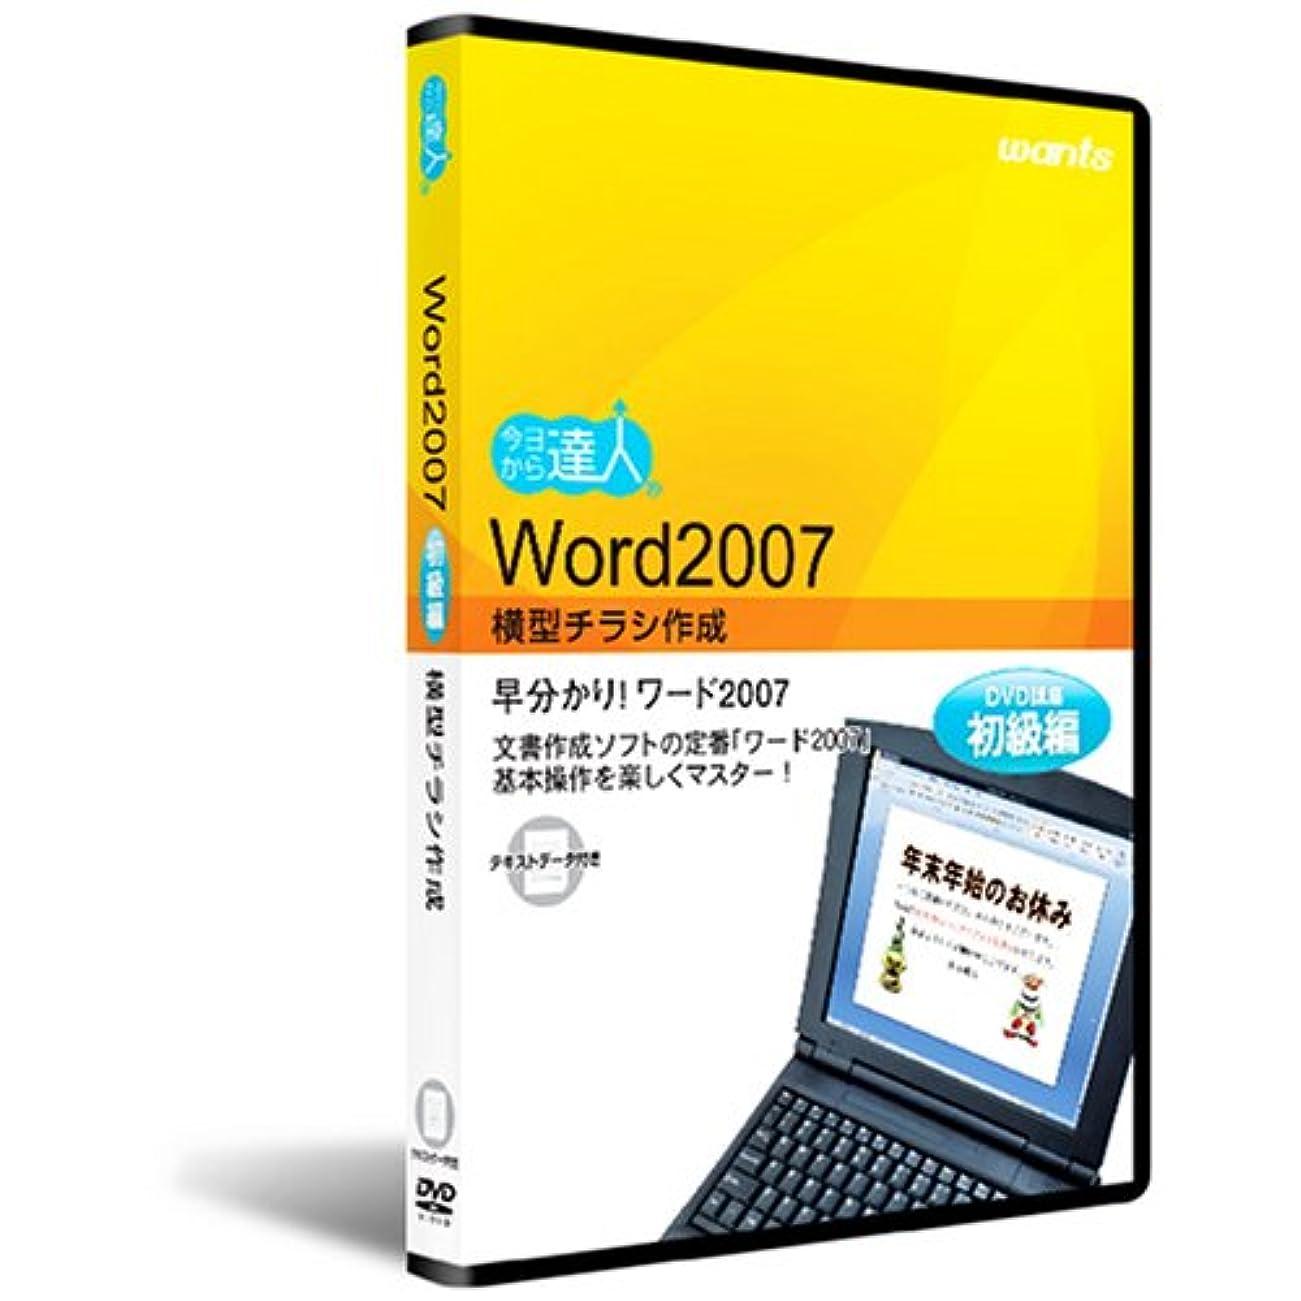 Word2007:DVD講座 初級編 横型チラシ作成